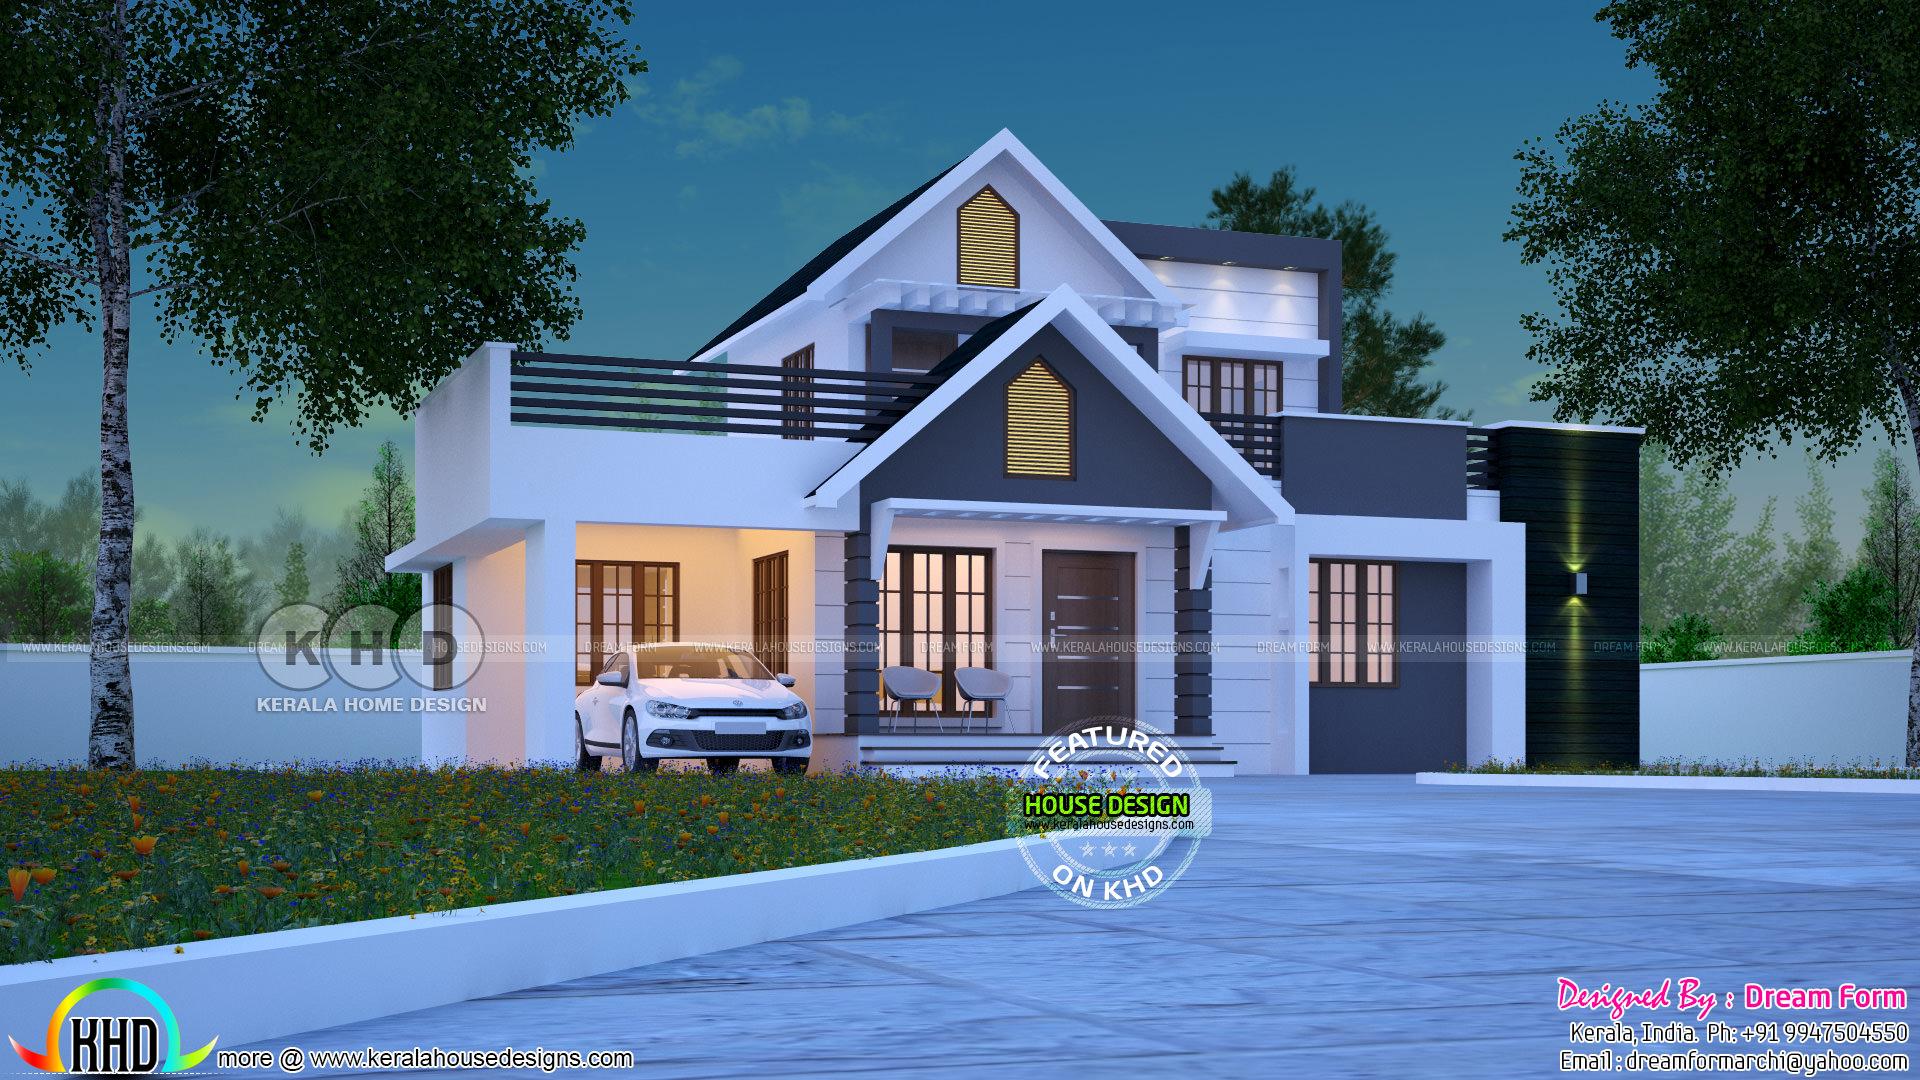 Marvelous Ground Floor Plan Width : 13.50 M Ground Floor Plan Length : 11.00 M.  Facilities Read More » Please Follow Kerala Home Design